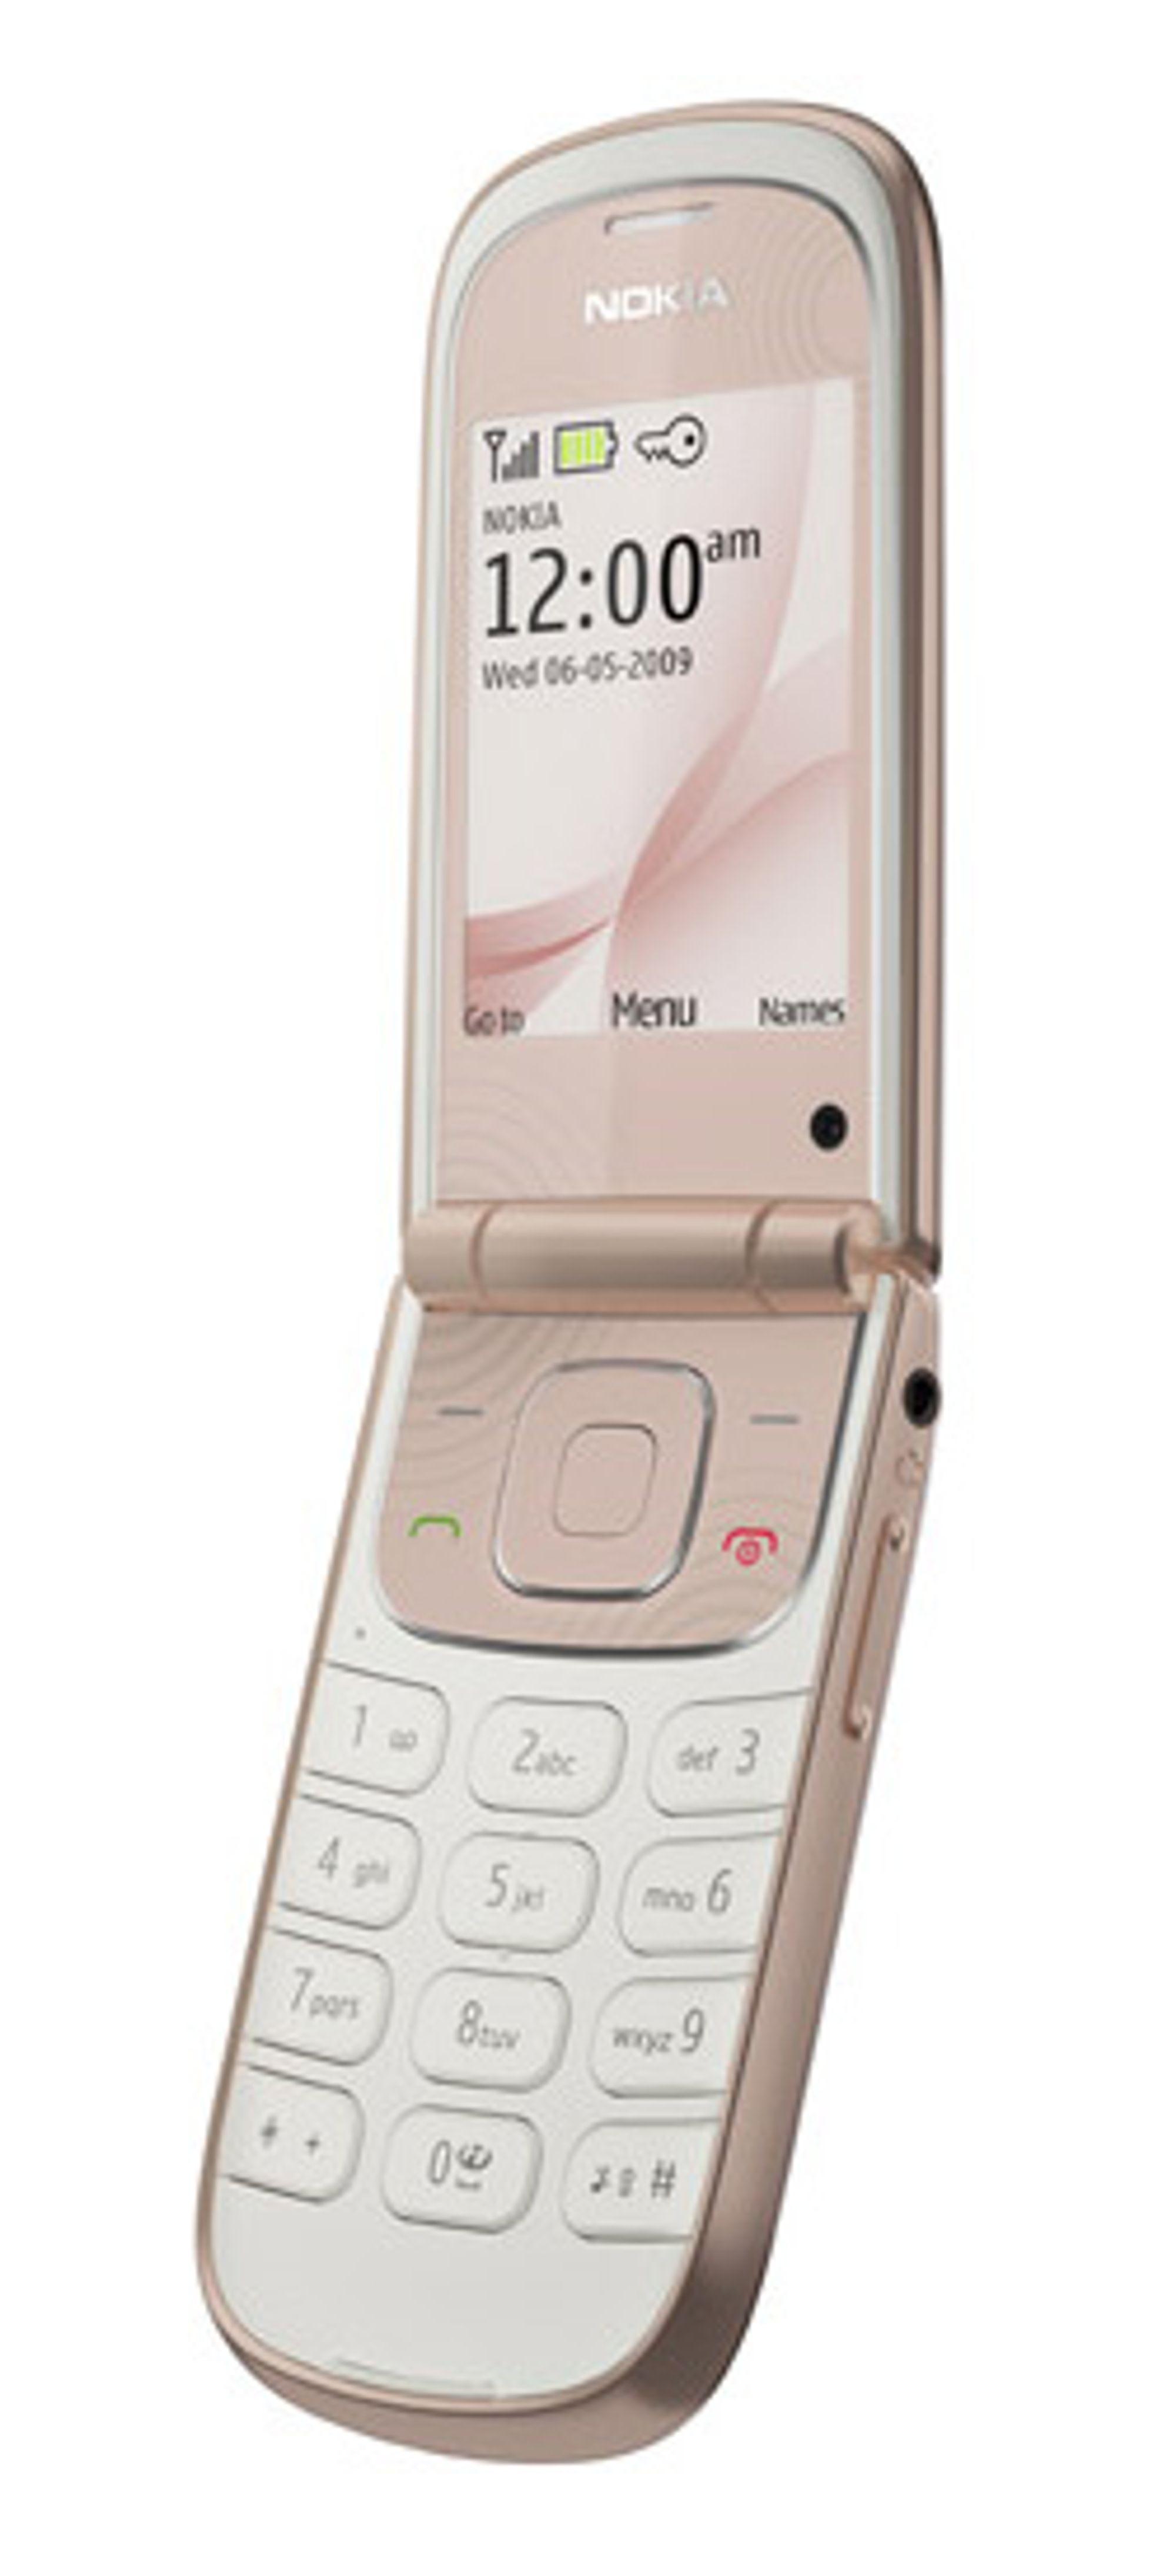 Slik ser Nokias 3710 fold ut. (Foto: Nokia)